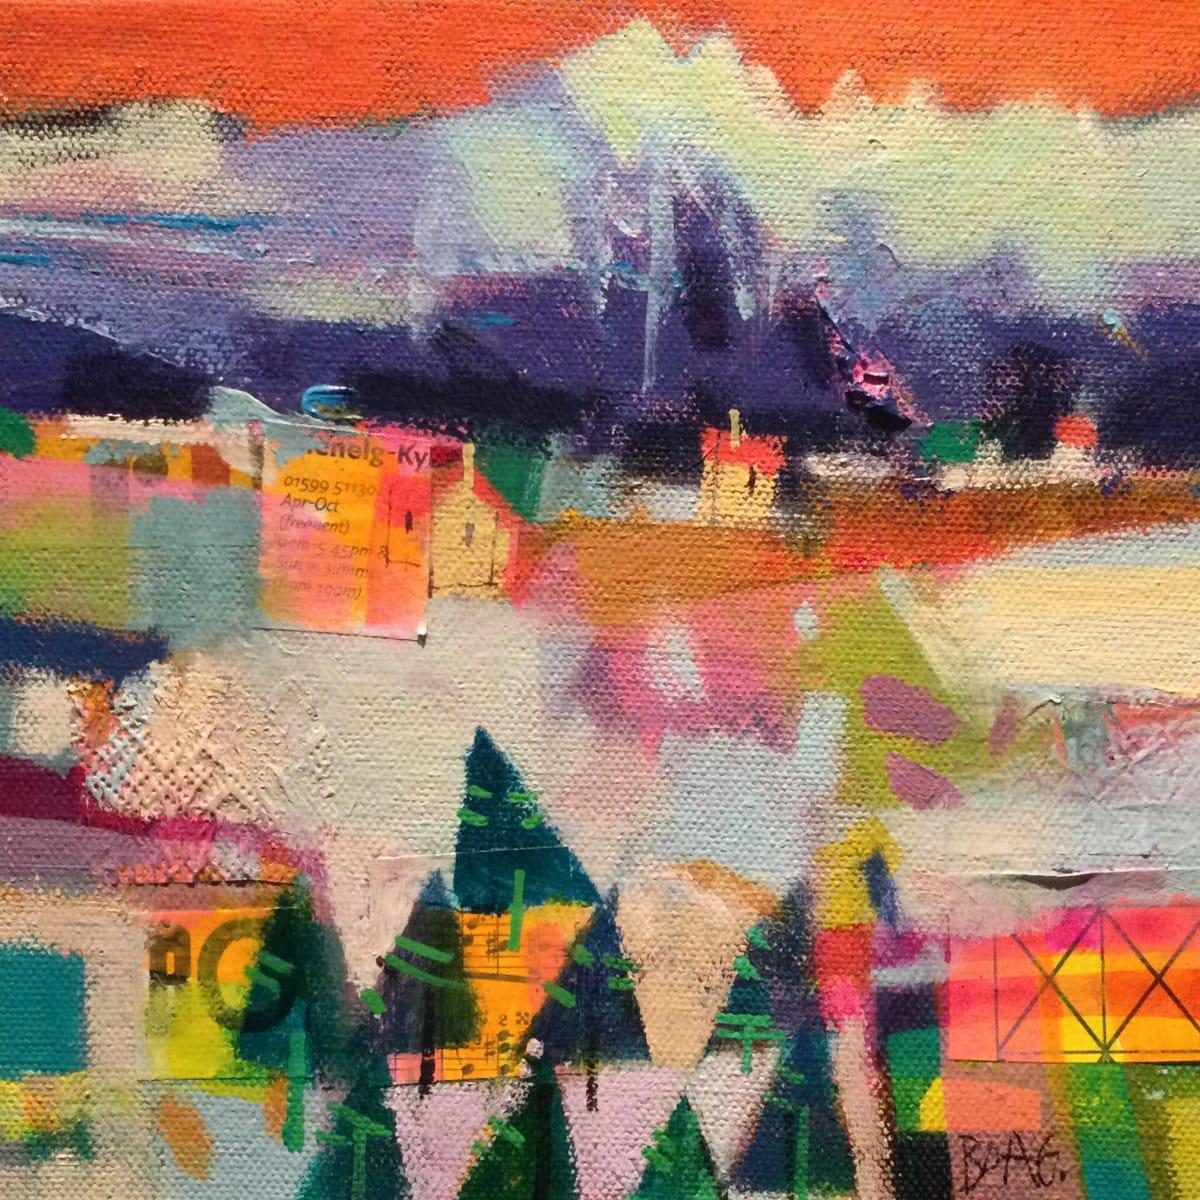 Winter Cuillins by francis boag